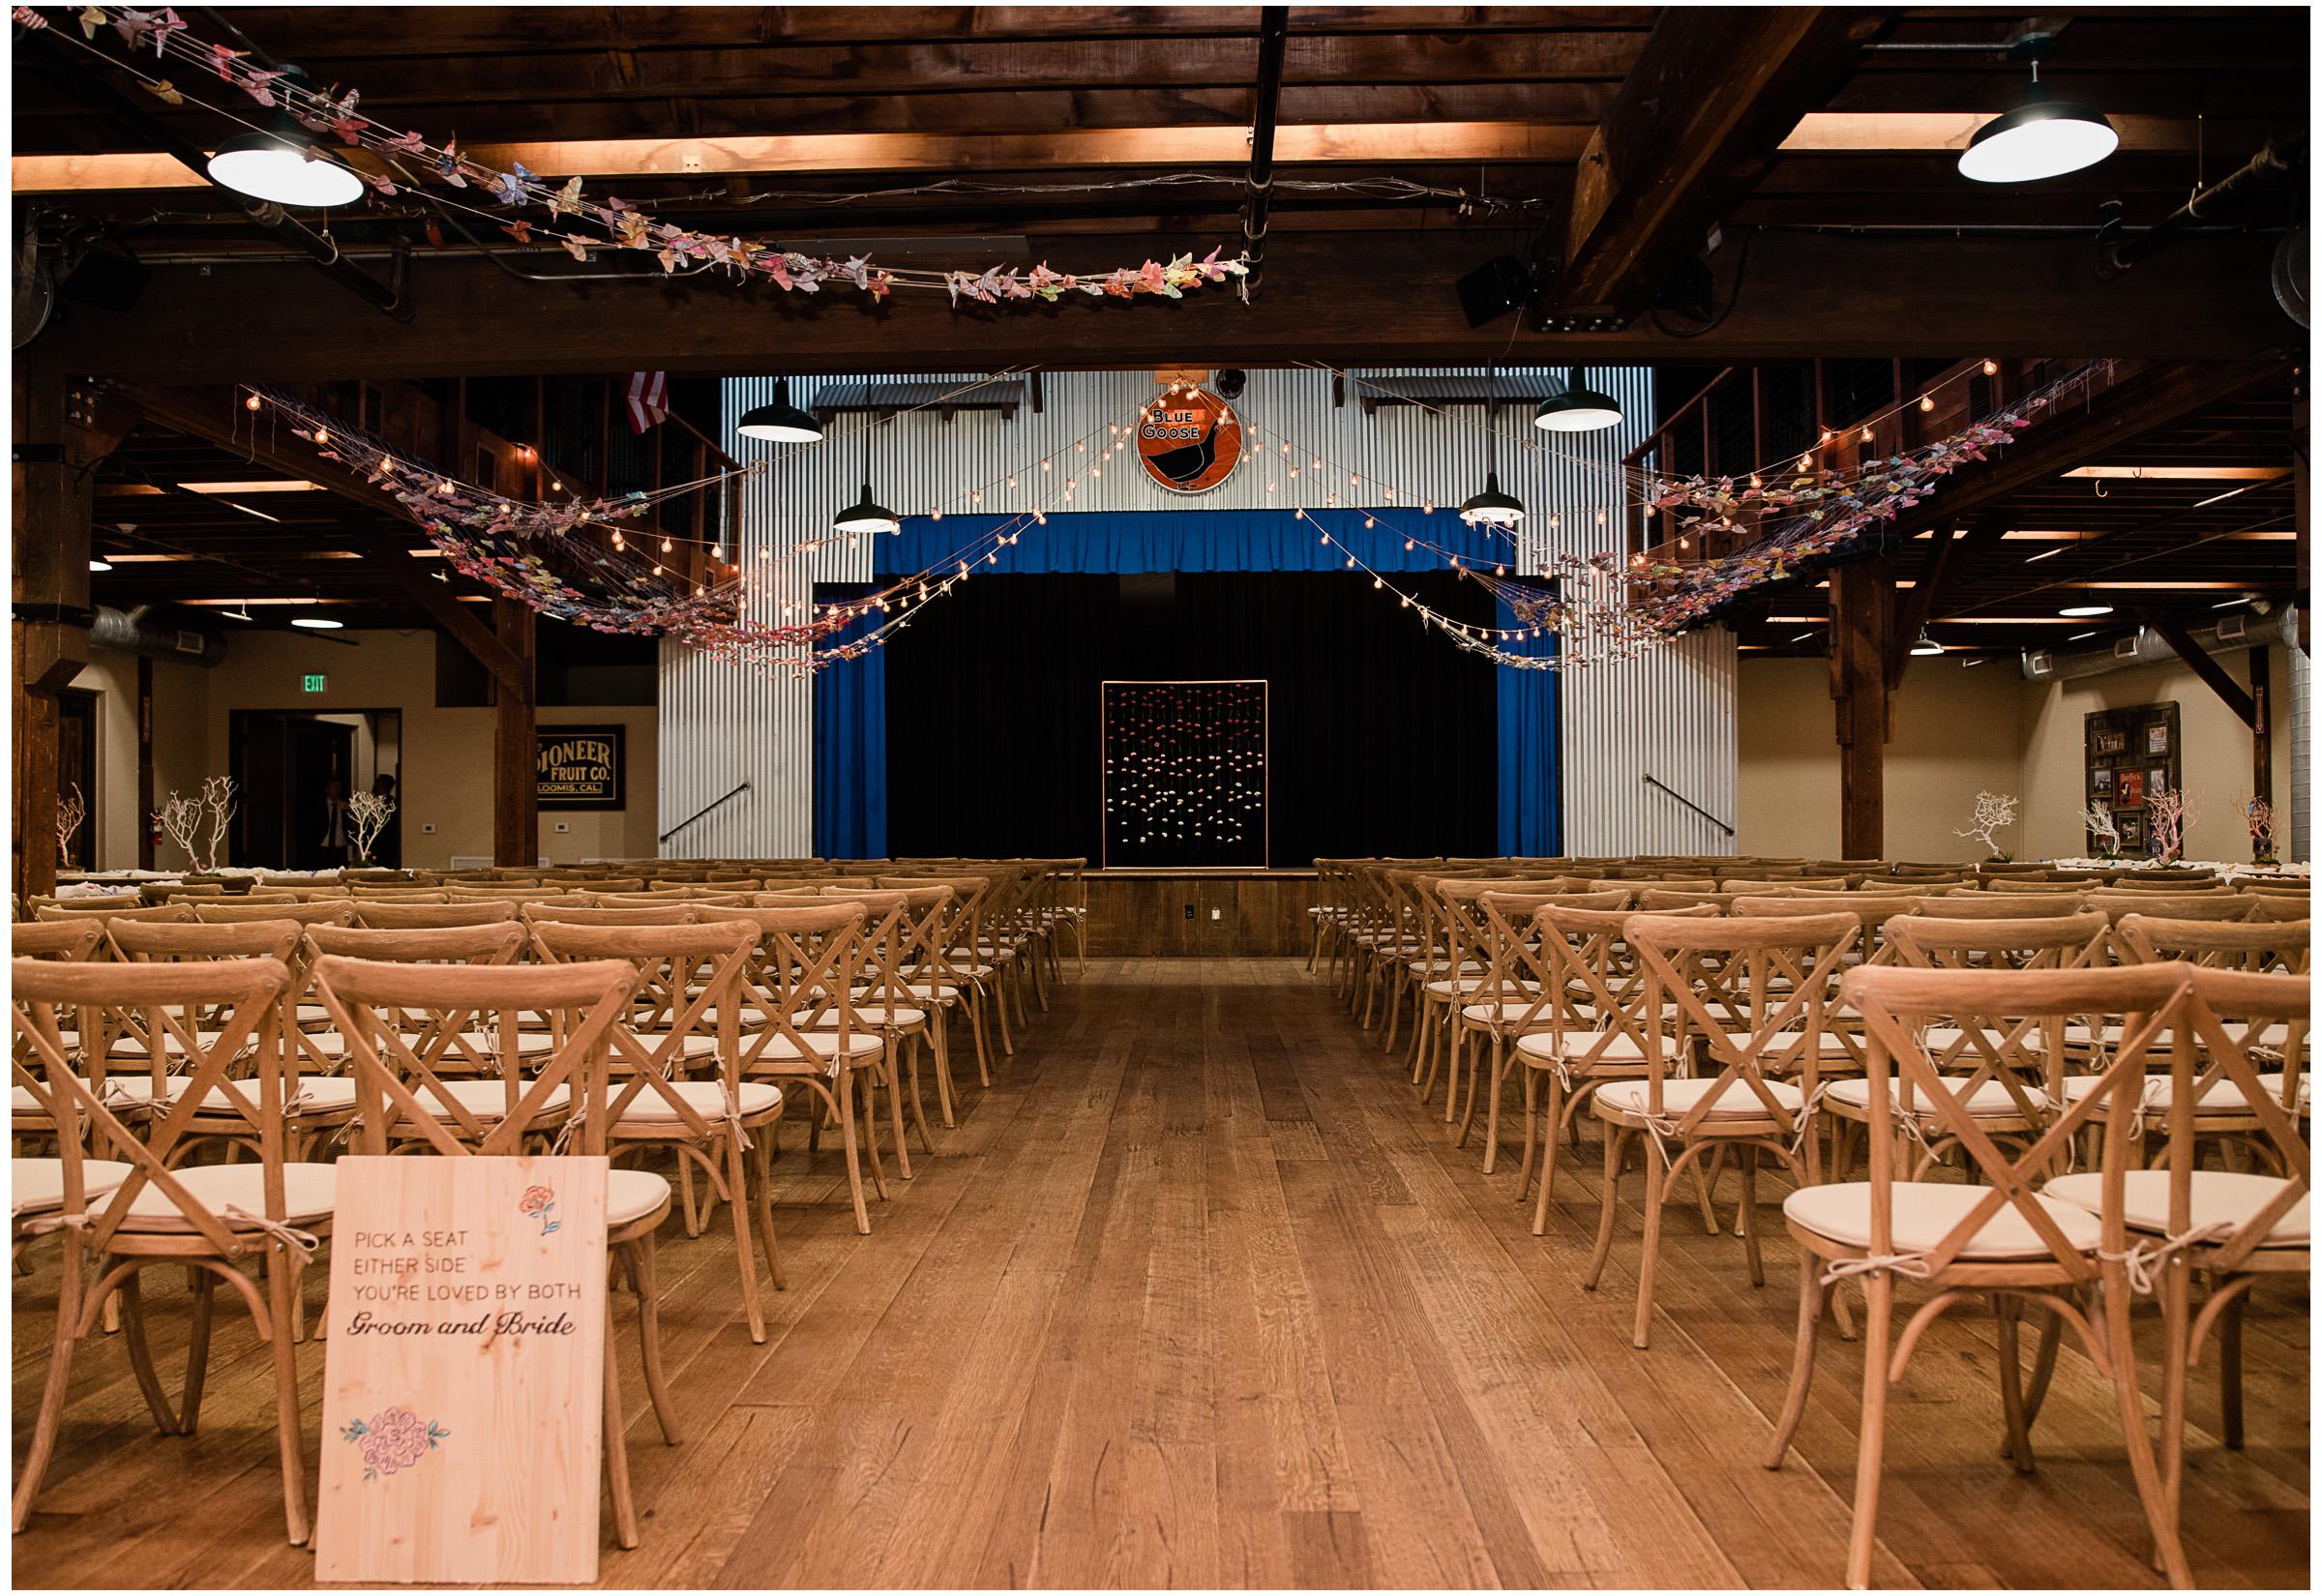 Loomis Wedding - Sacramento Photographer - Blue Goose - Justin Wilcox Photography - 2.jpg